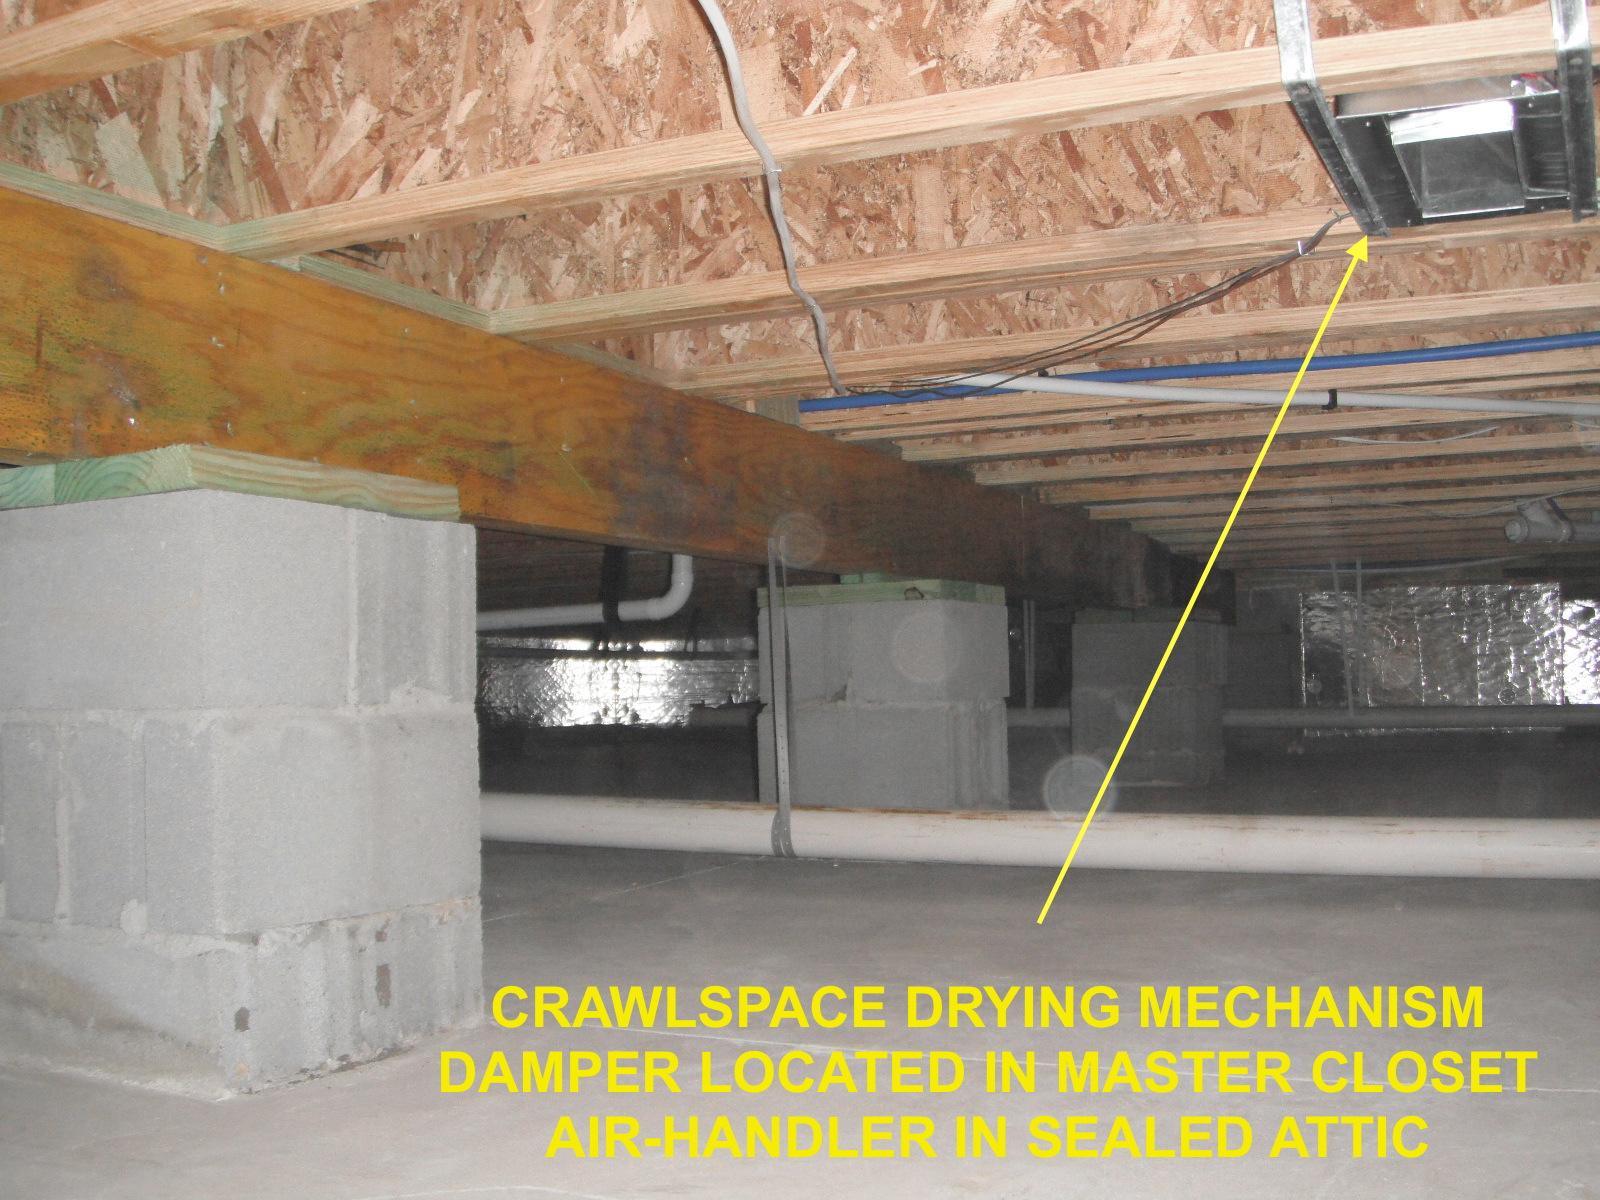 CRAWLSPACE DRYING MECHANISM via attic YellowTXT